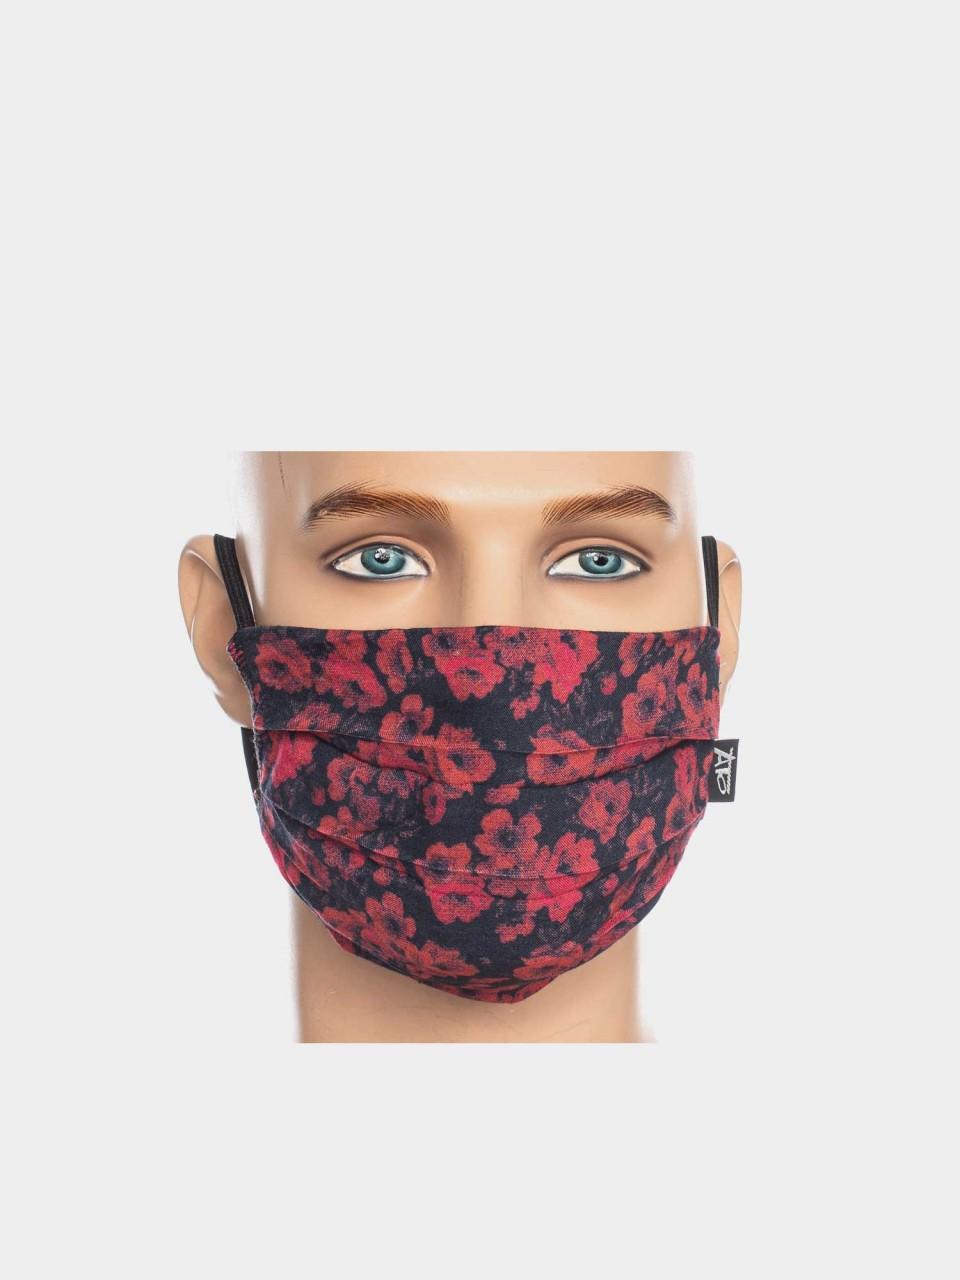 Maske ATO Rote Blumen BLK/RD